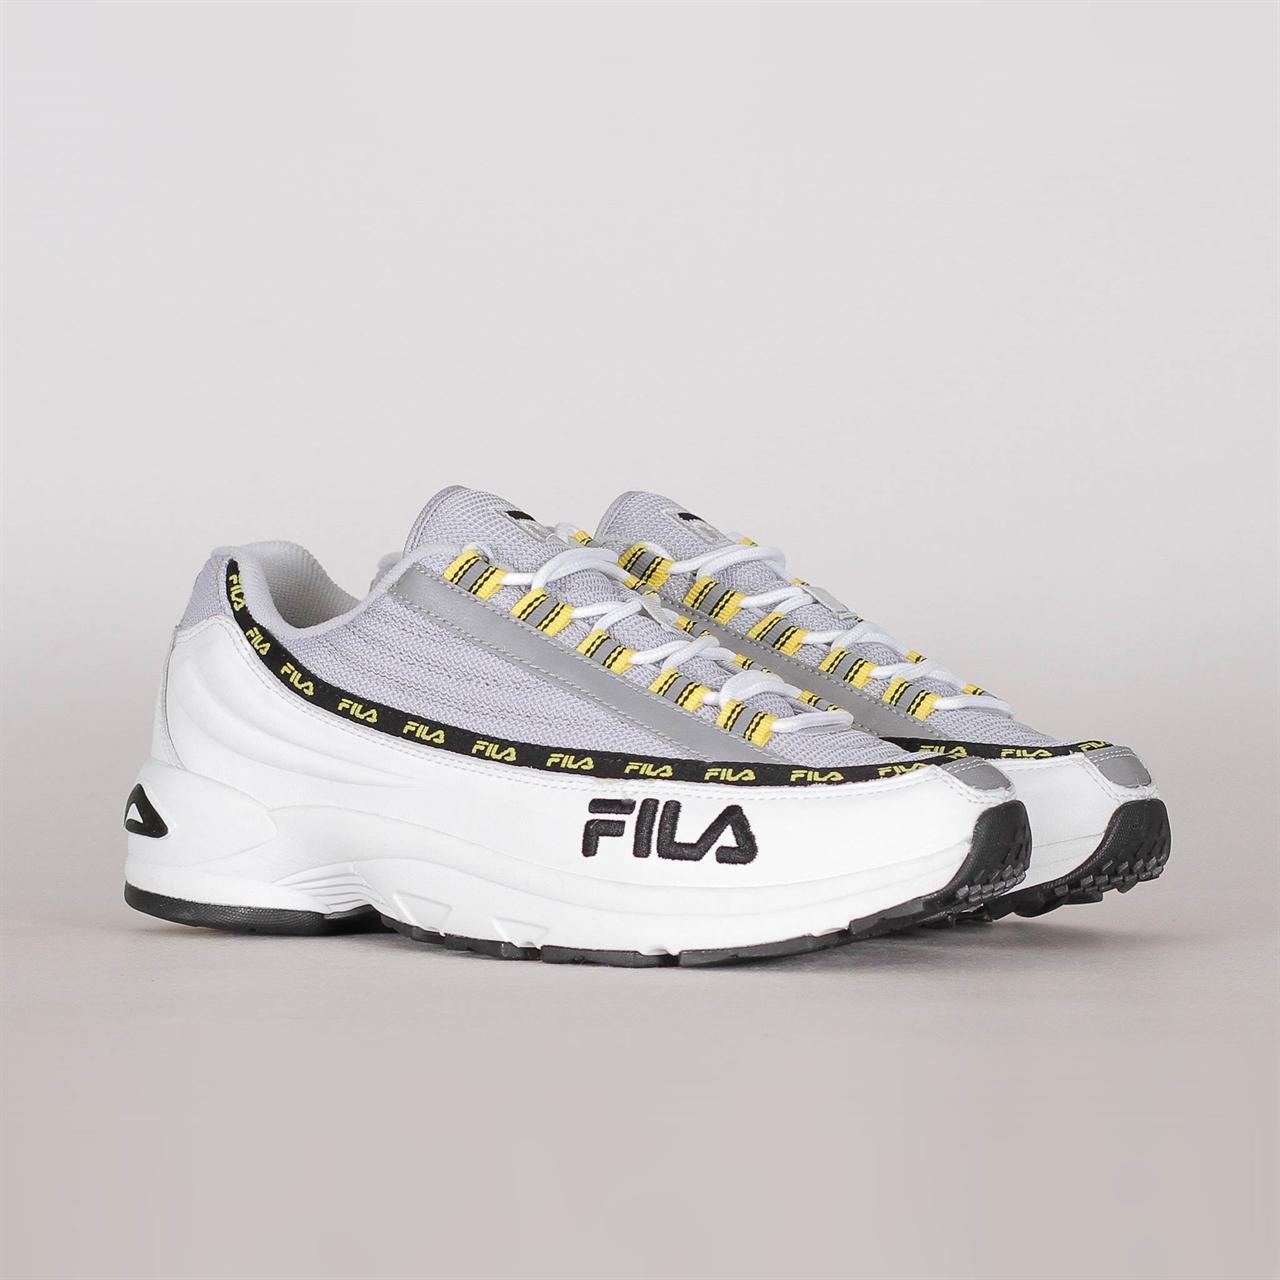 8099ff408362 Shelta - Fila DSTR97 (1010570-H1)